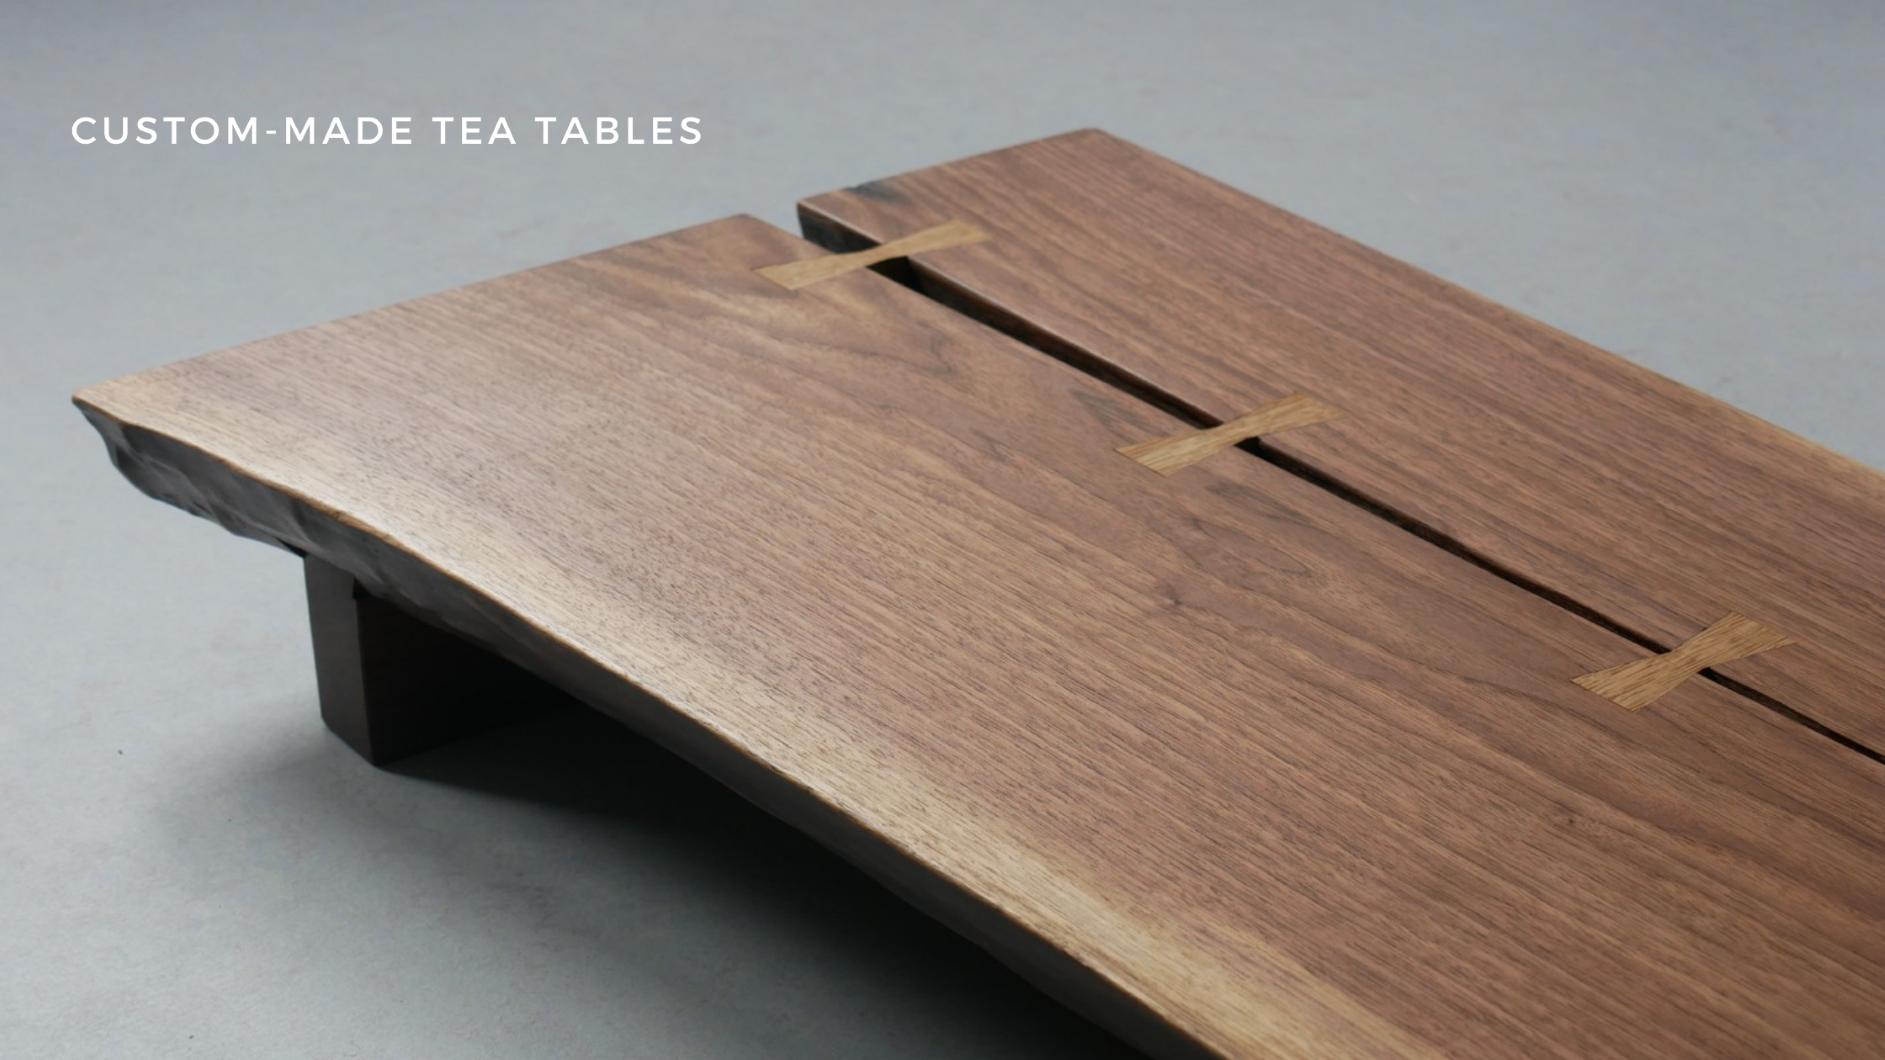 Custom-made tea table from american walnut